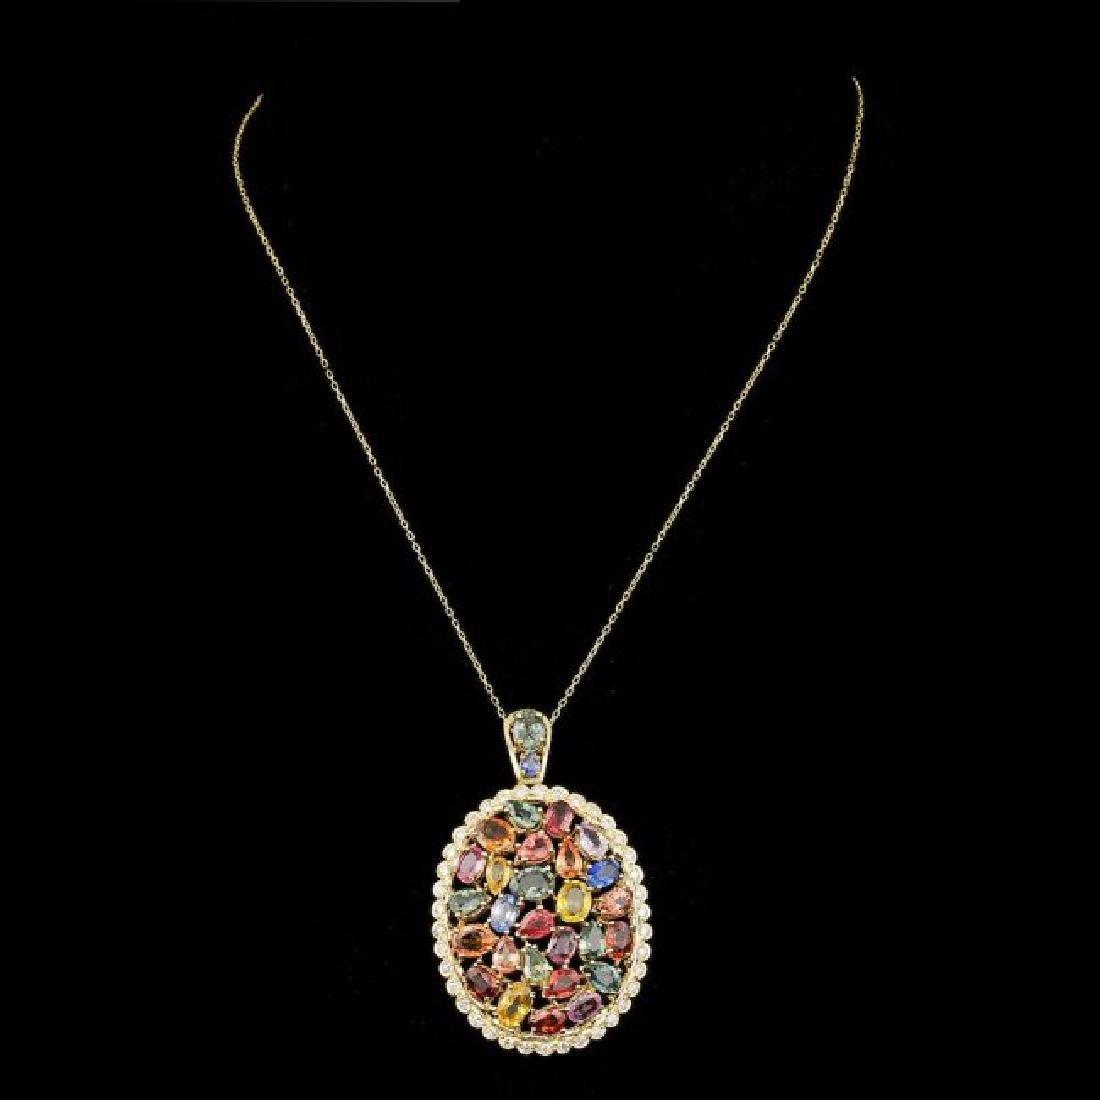 14k Gold 17.50ct Sapphire 1.10ct Diamond Pendant - 2